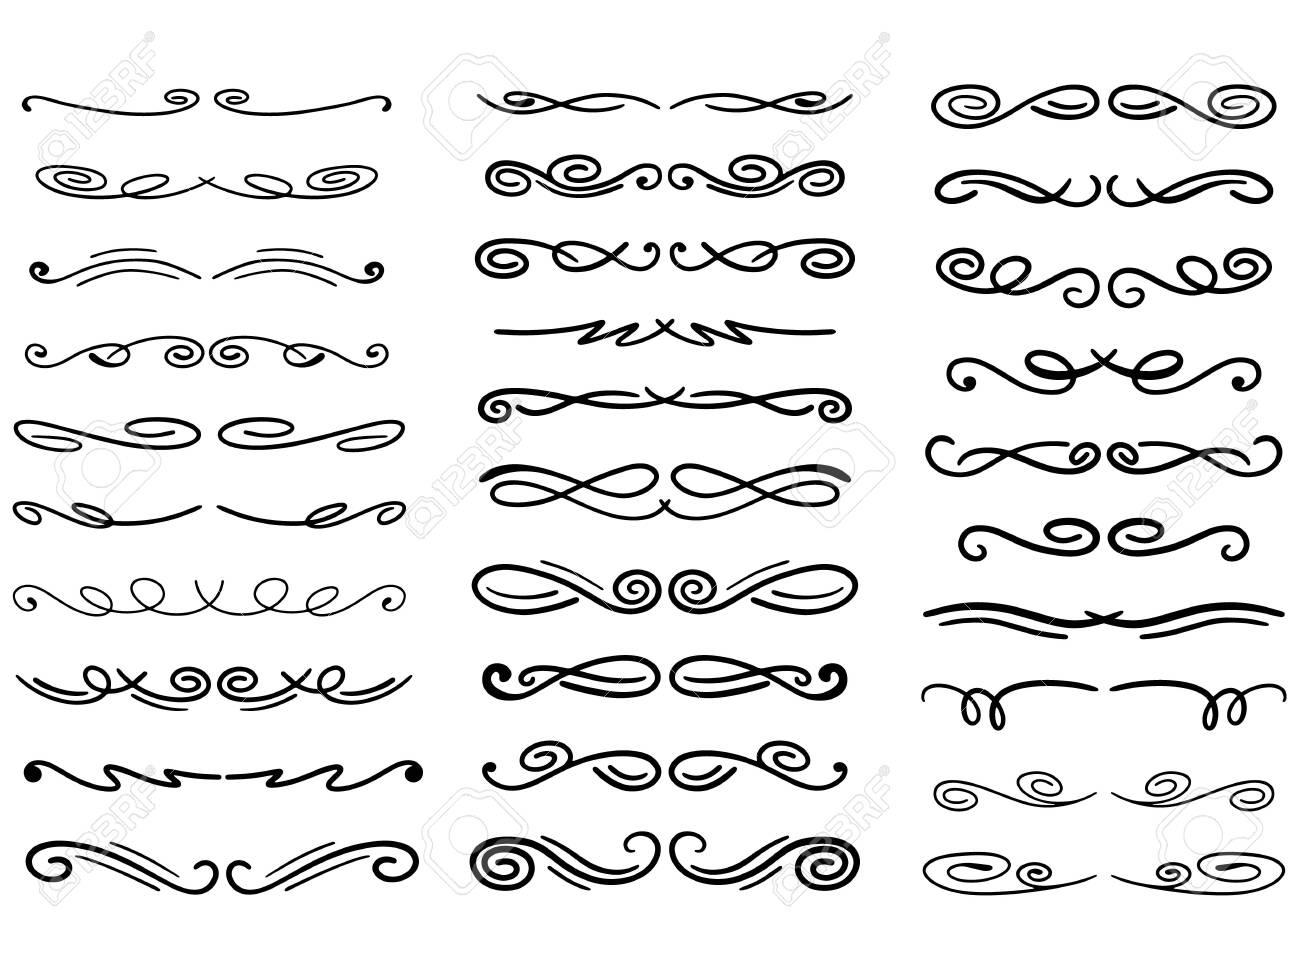 Set of vector decorative dividers - 147574928